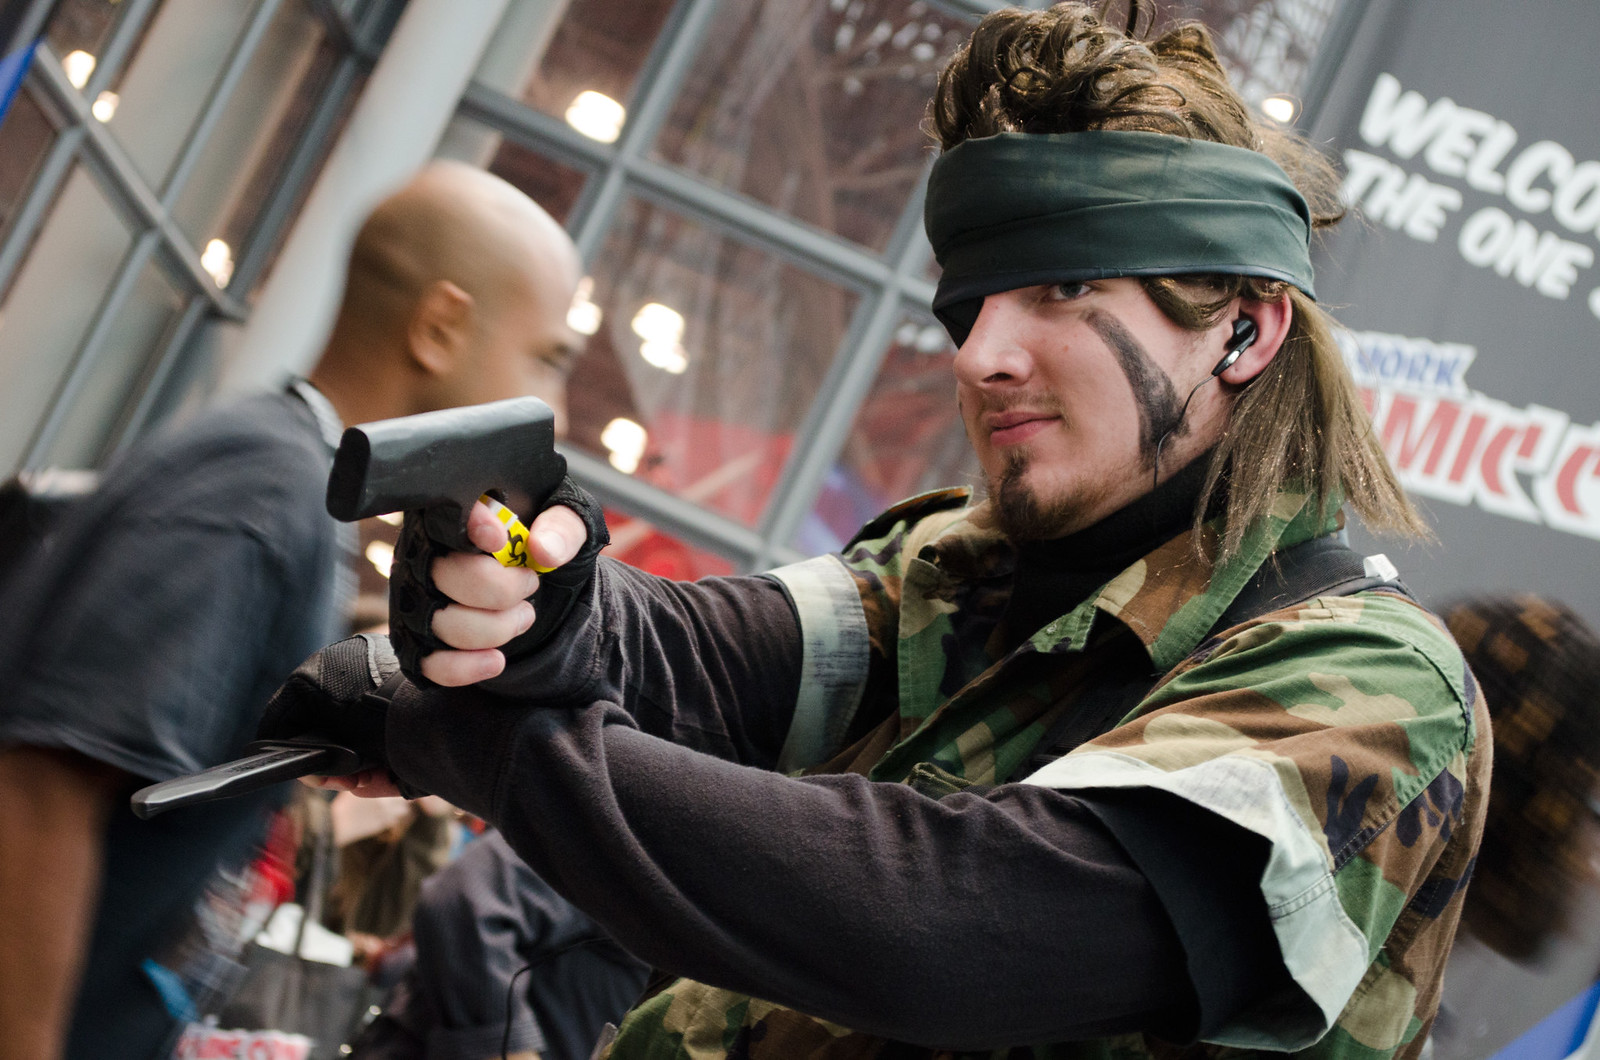 Metal Gear Cosplay NYCC 2013